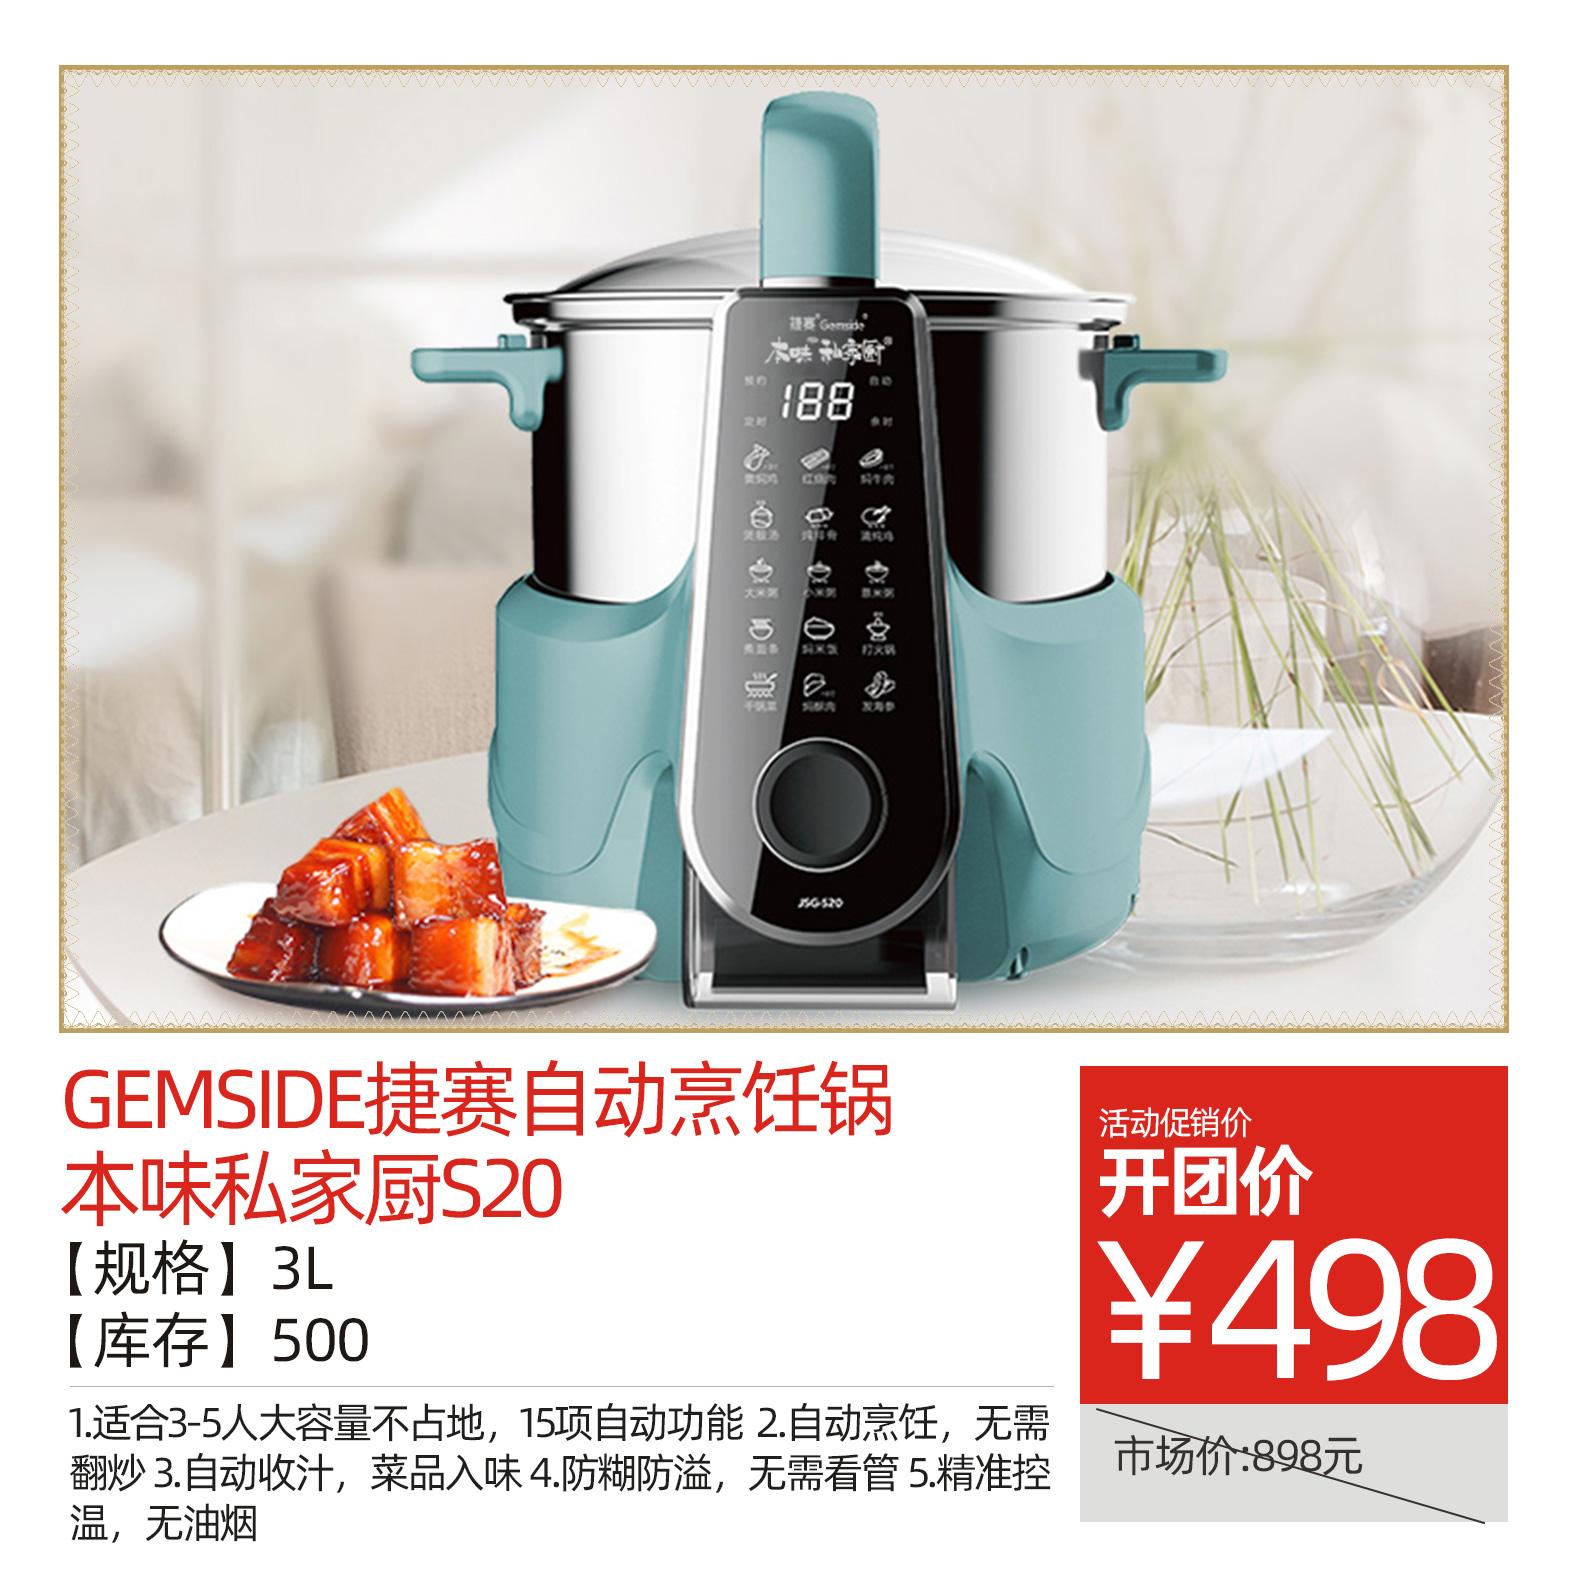 Gemside捷赛自动烹饪锅本味私家厨S20